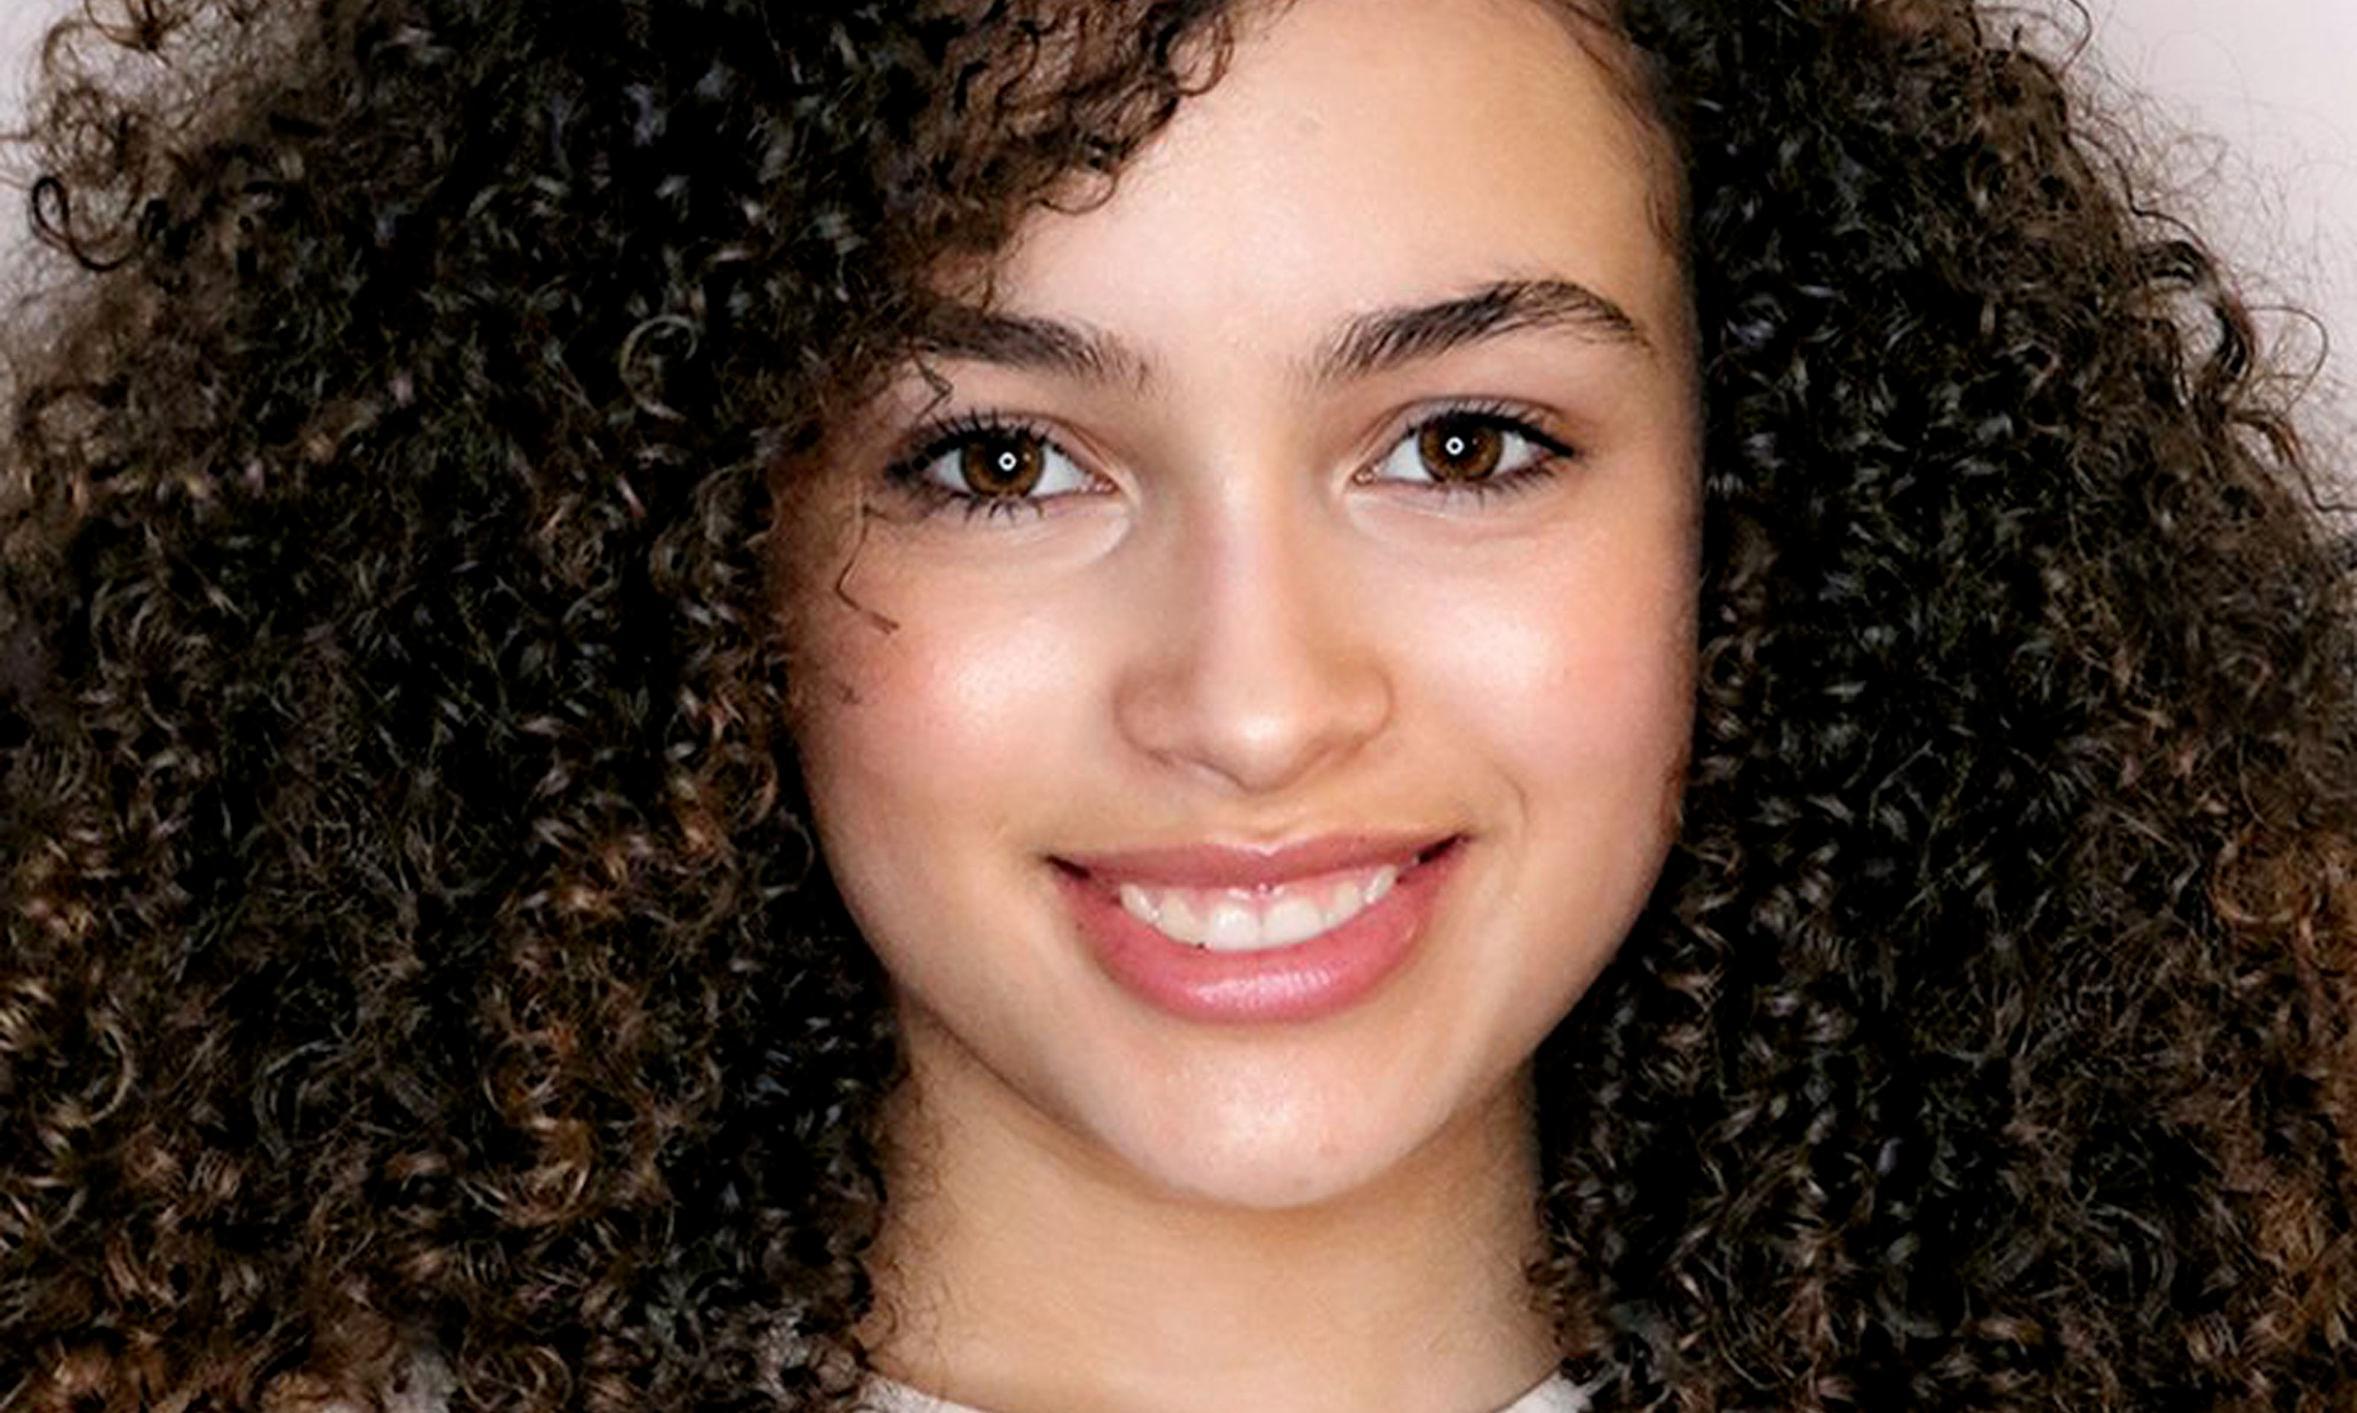 CBBC star Mya-Lecia Naylor dies suddenly aged 16